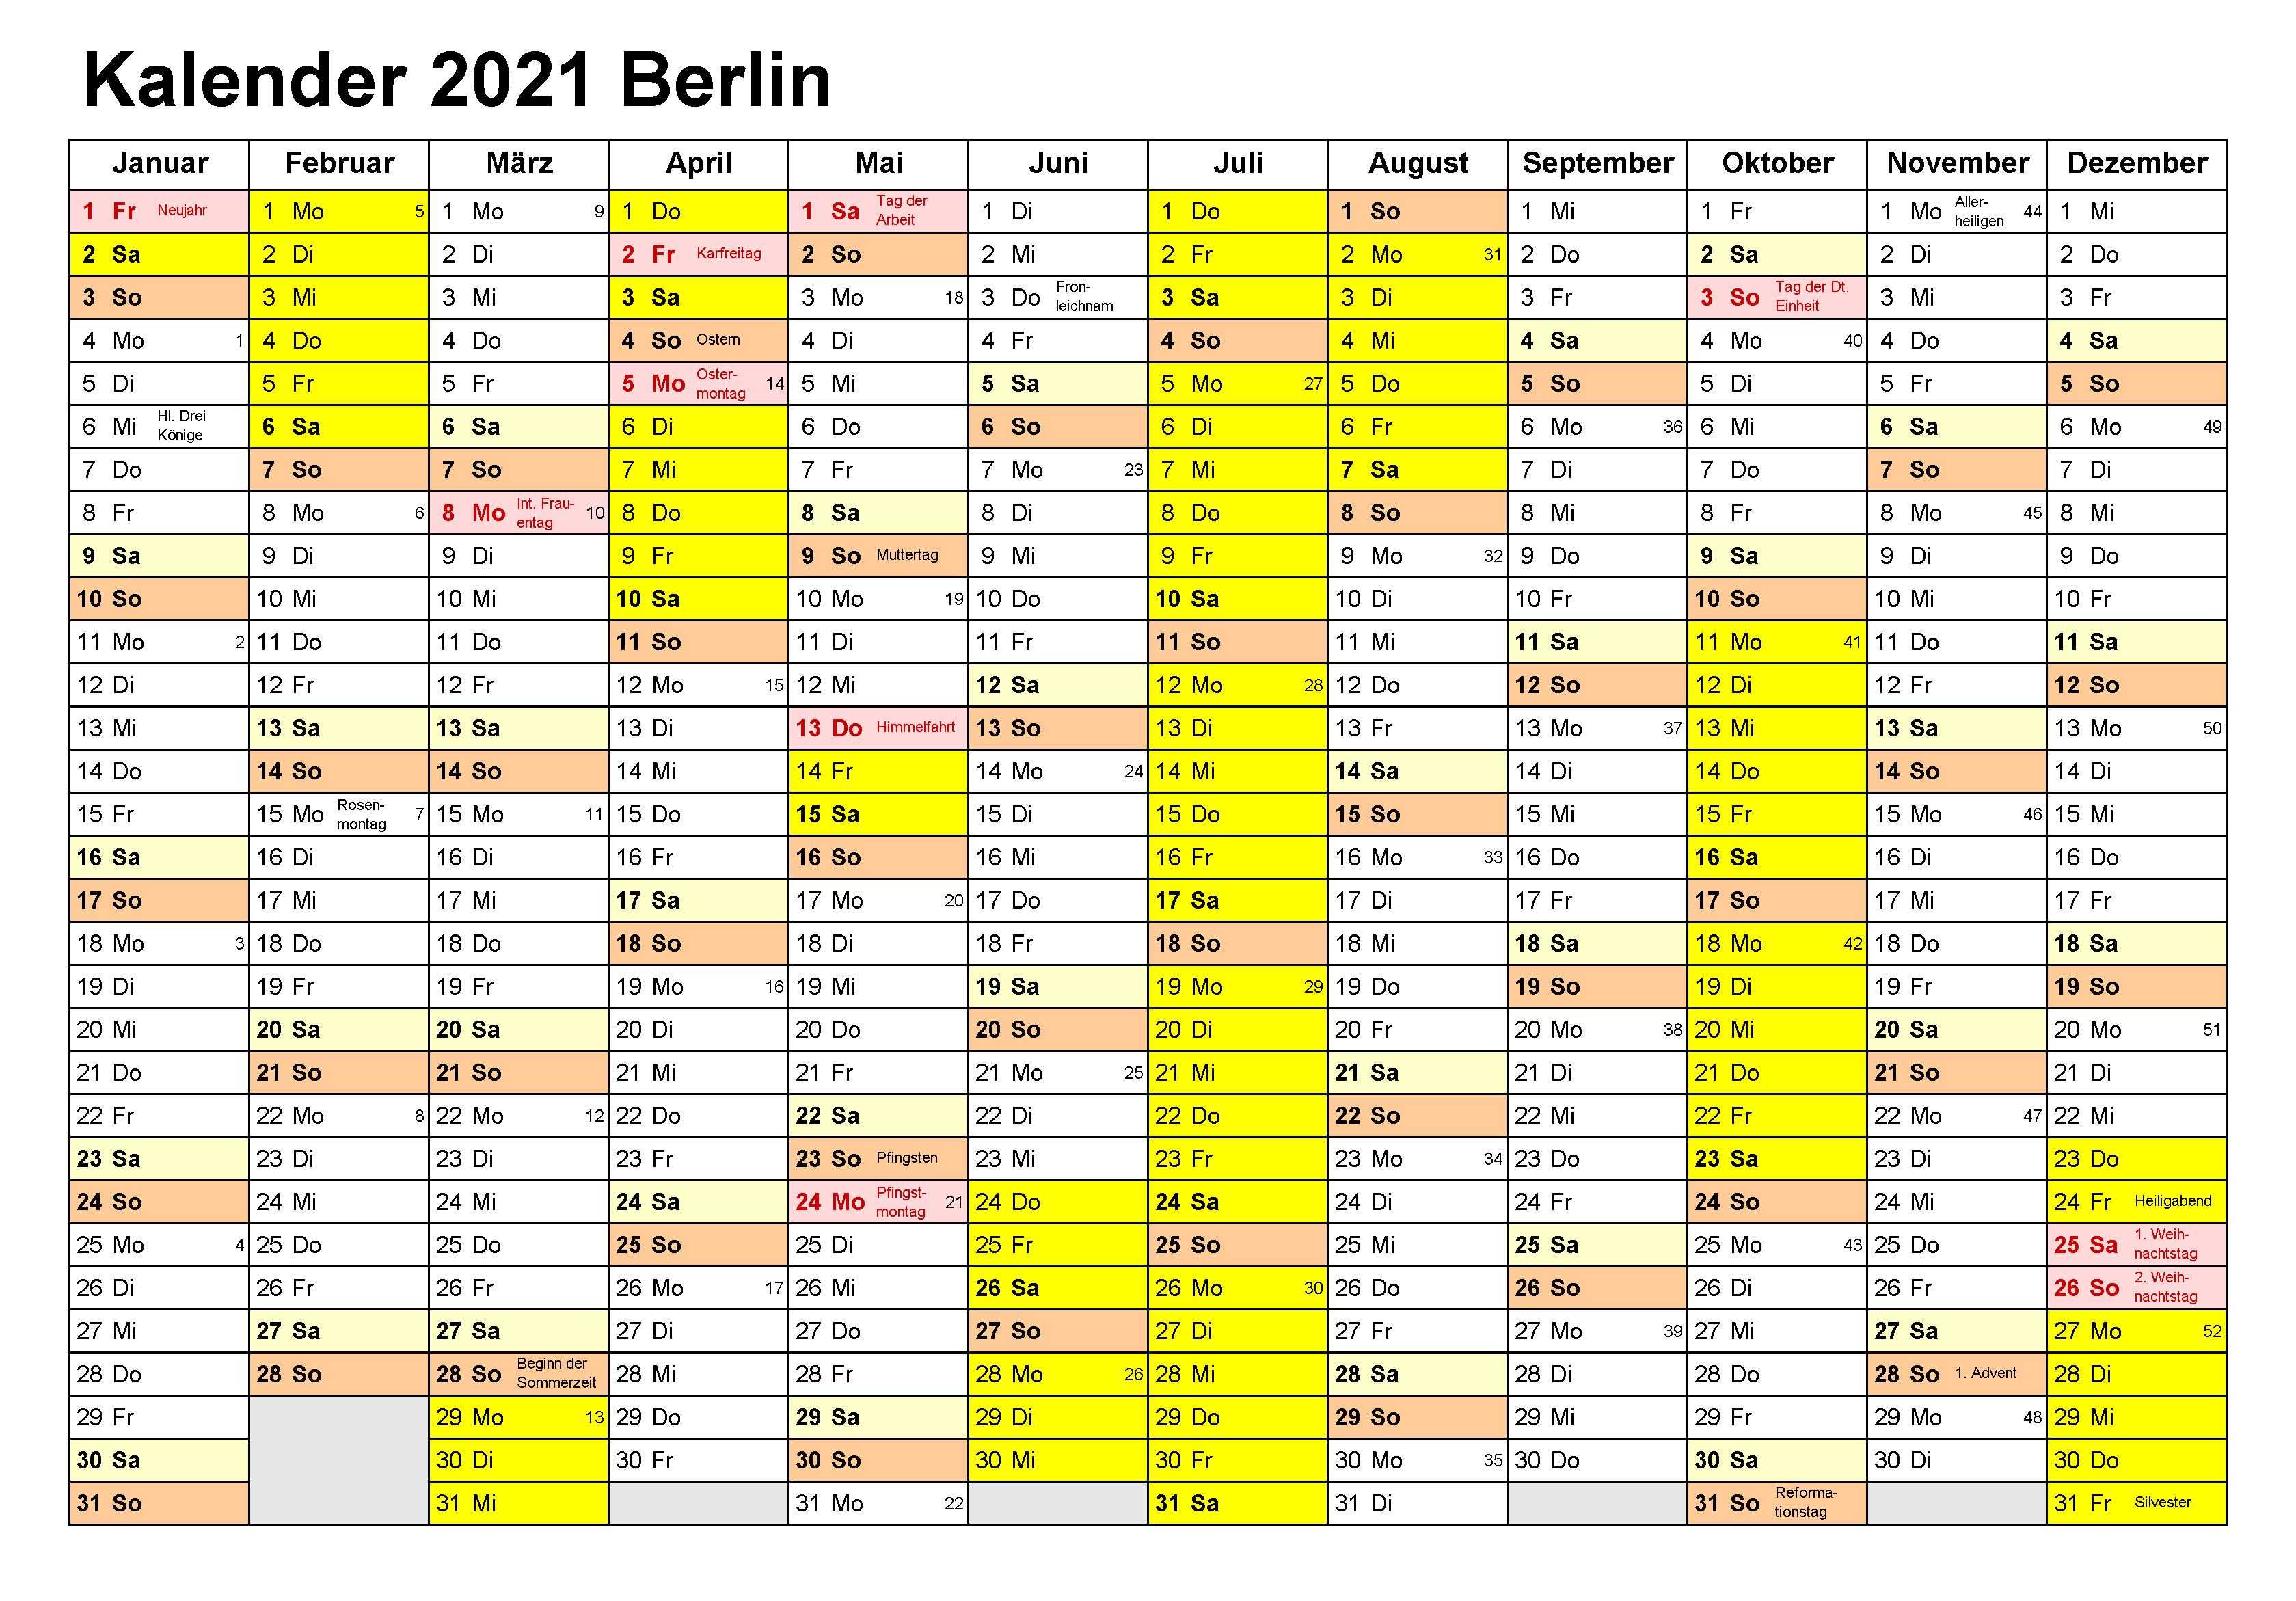 Kalender Berlin 2021 Zum Ausdrucken